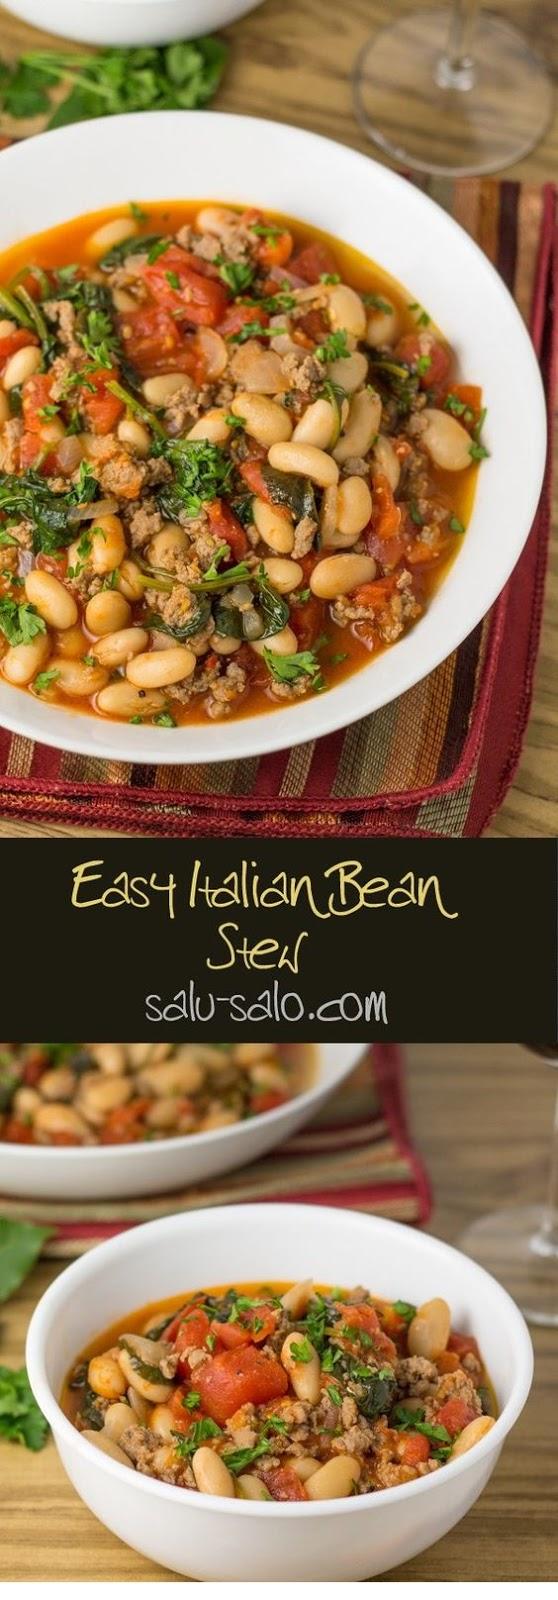 Easy Italian Bean Stew